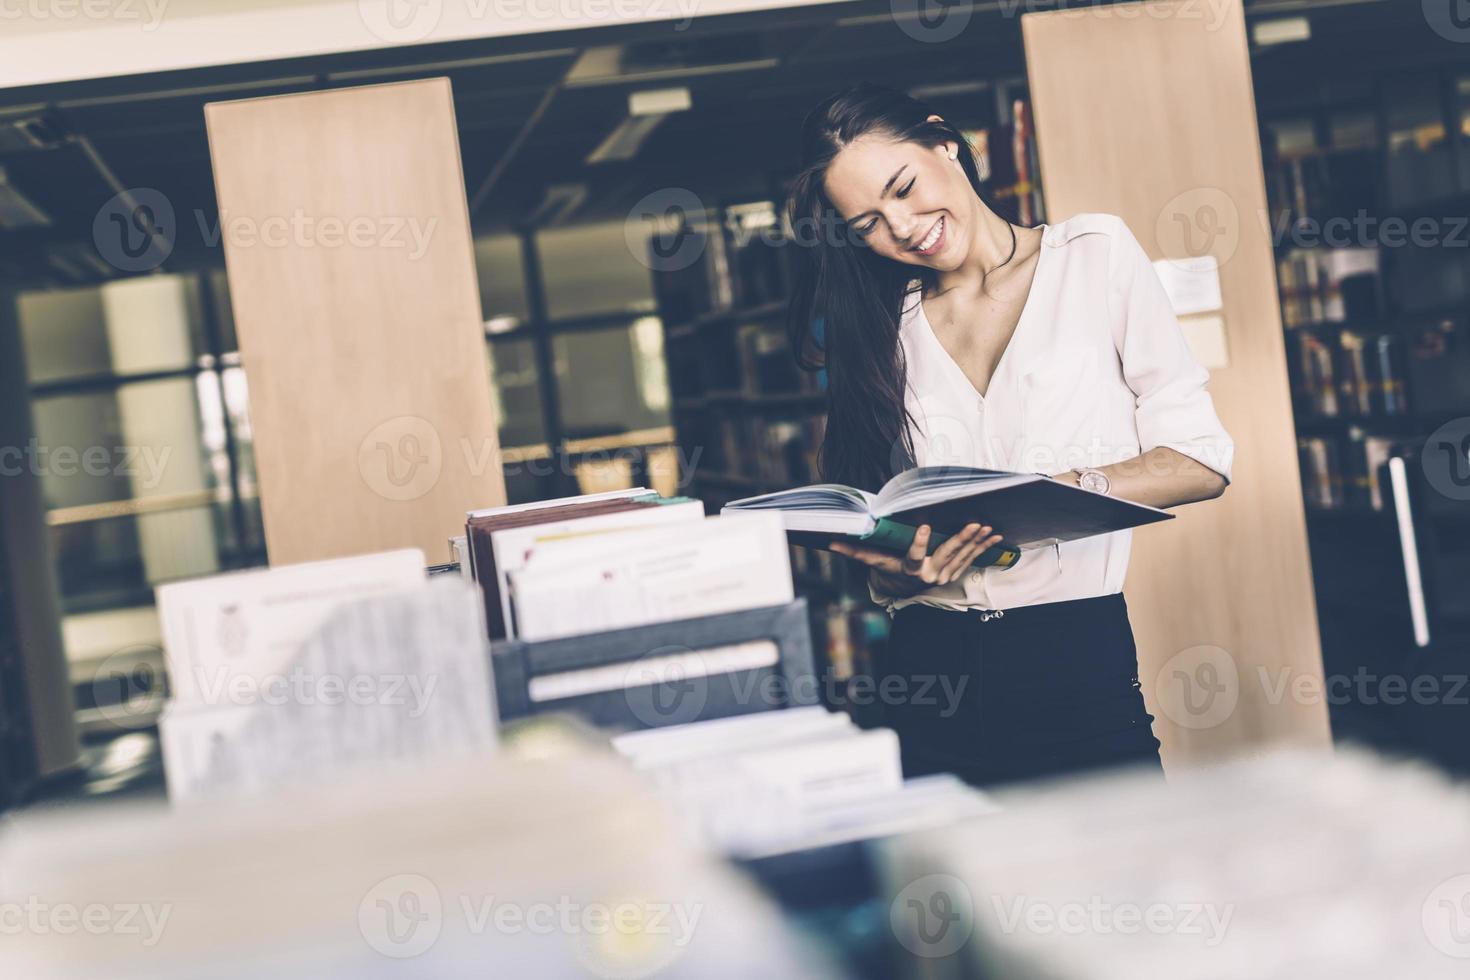 bella donna che legge libri in una biblioteca foto